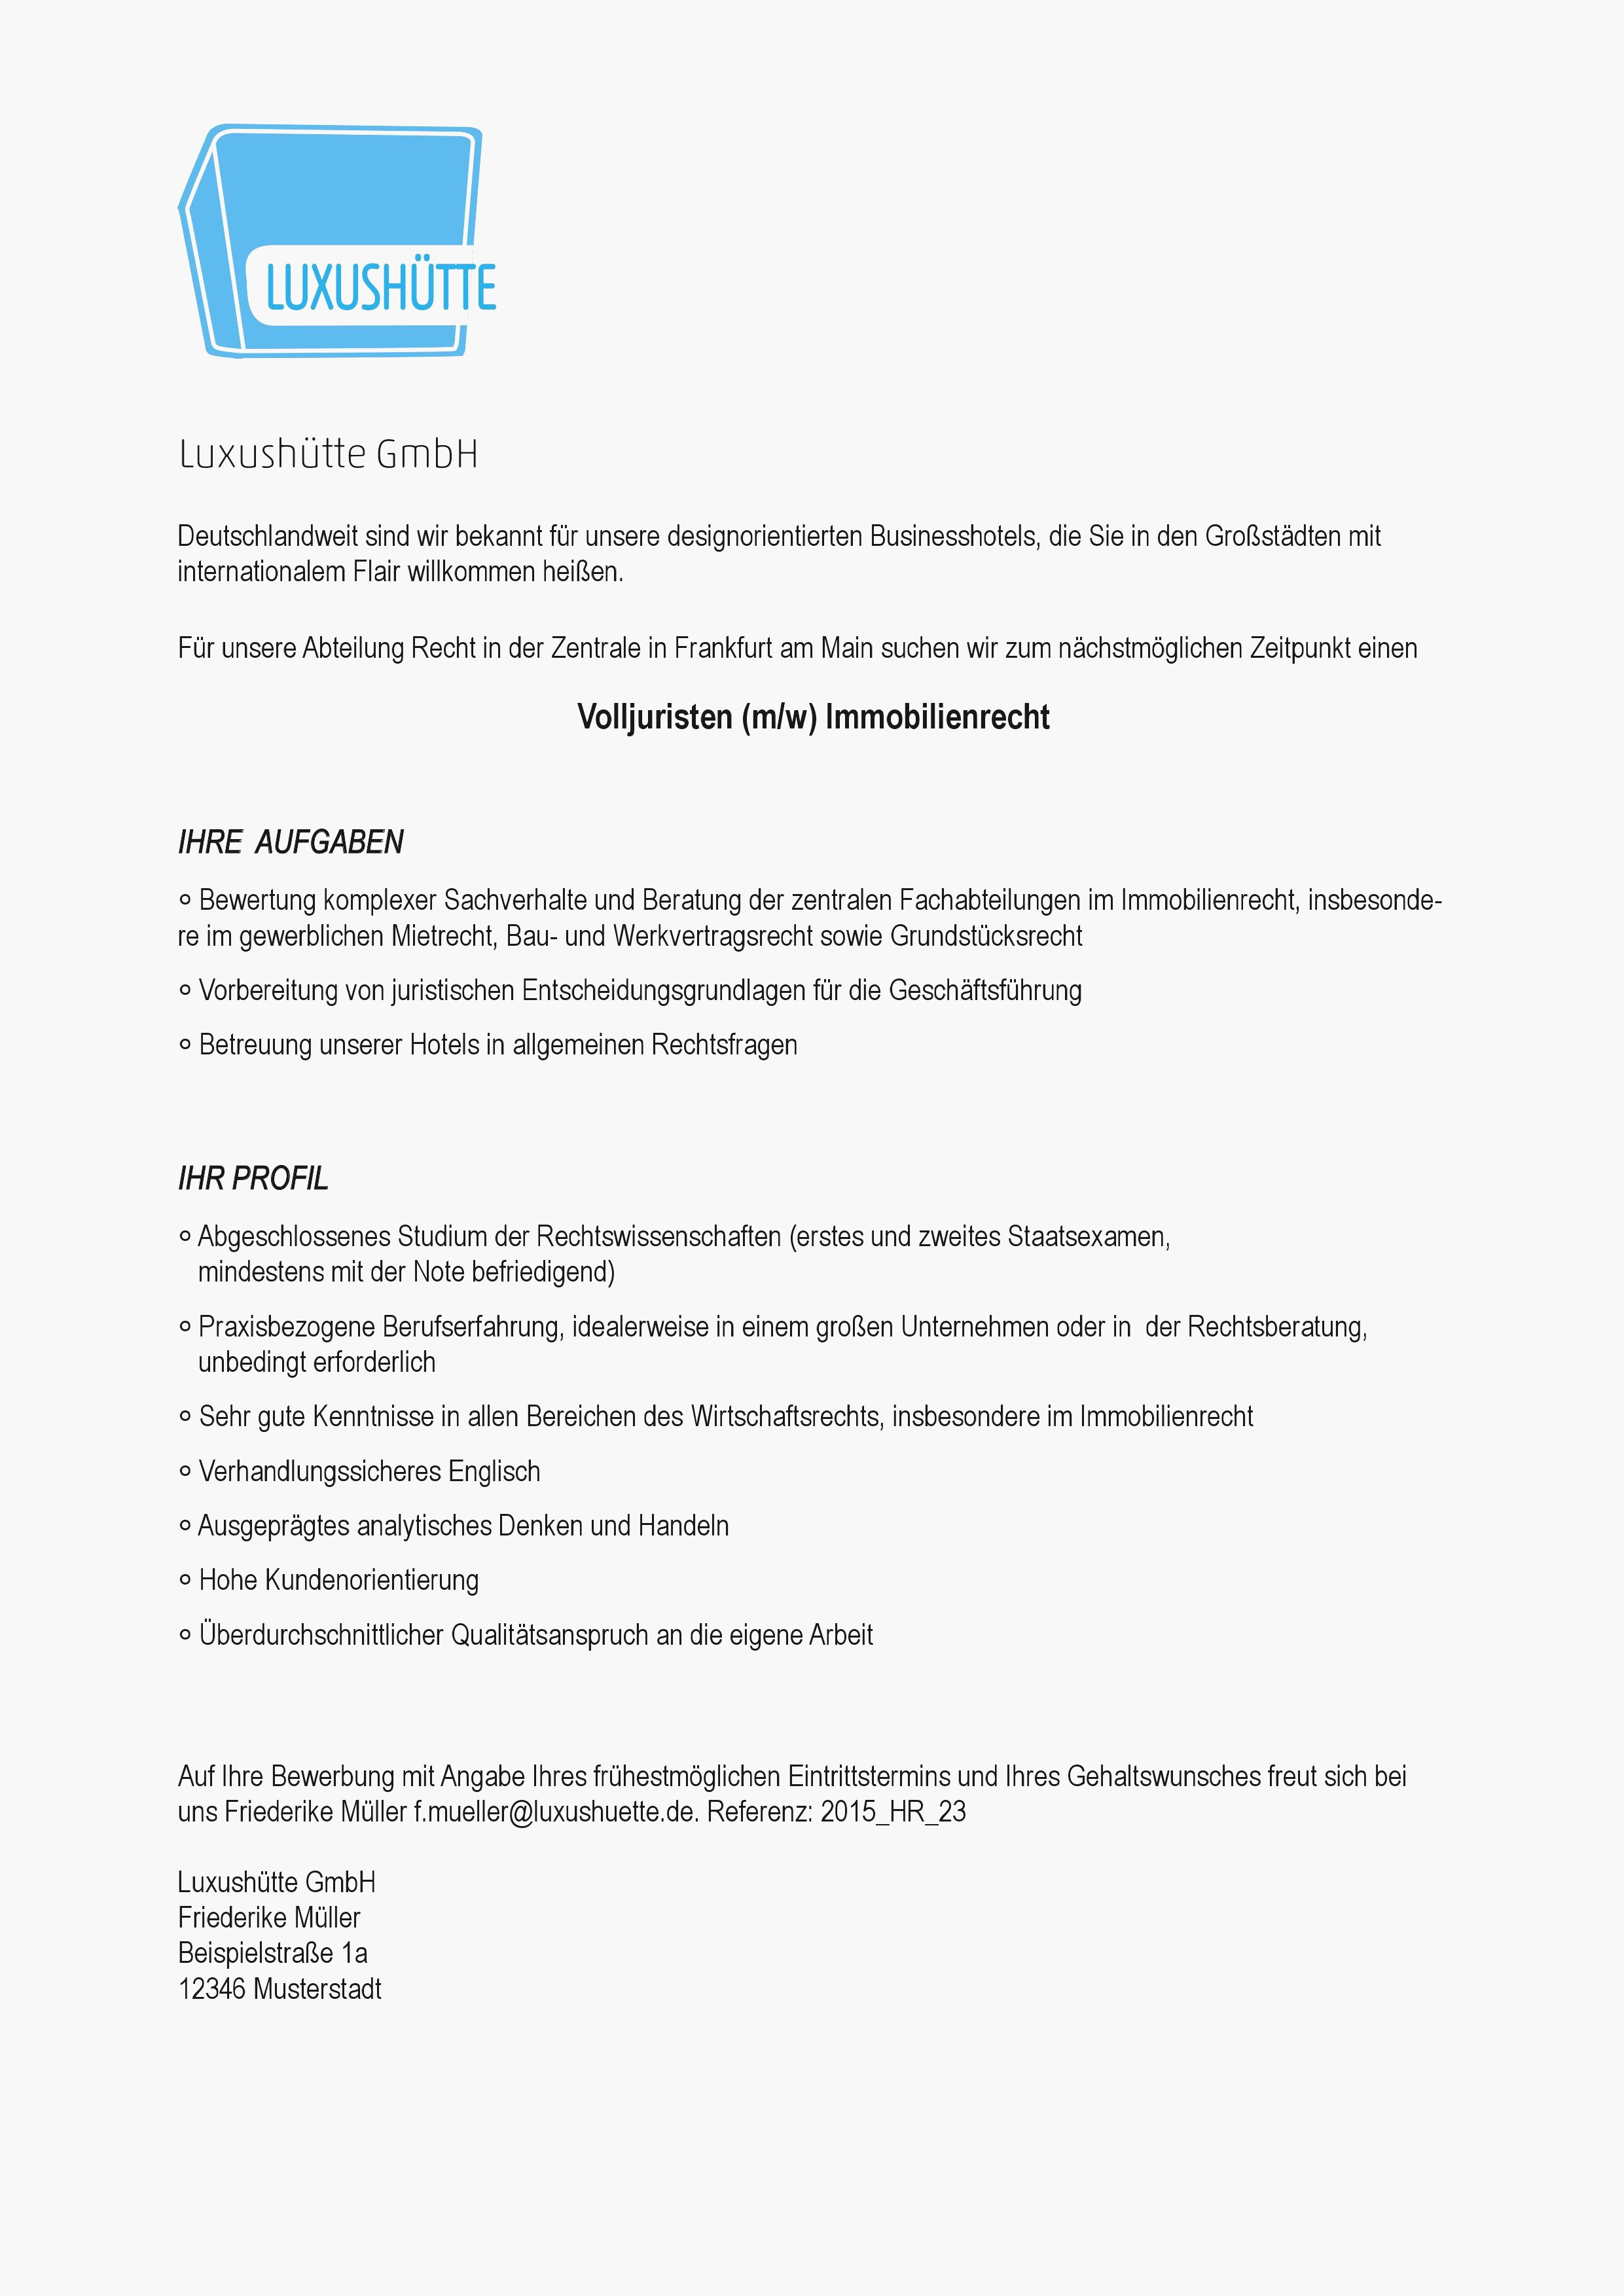 Kalender 2019 Pdf Hd Más Caliente Kostenlose Kalender 2015 Die Mindmanager Methode Pdf Of Kalender 2019 Pdf Hd Mejores Y Más Novedosos Kalender 2019 Bayern Ferien Und Feiertage tolle Leere Bayern Ferien